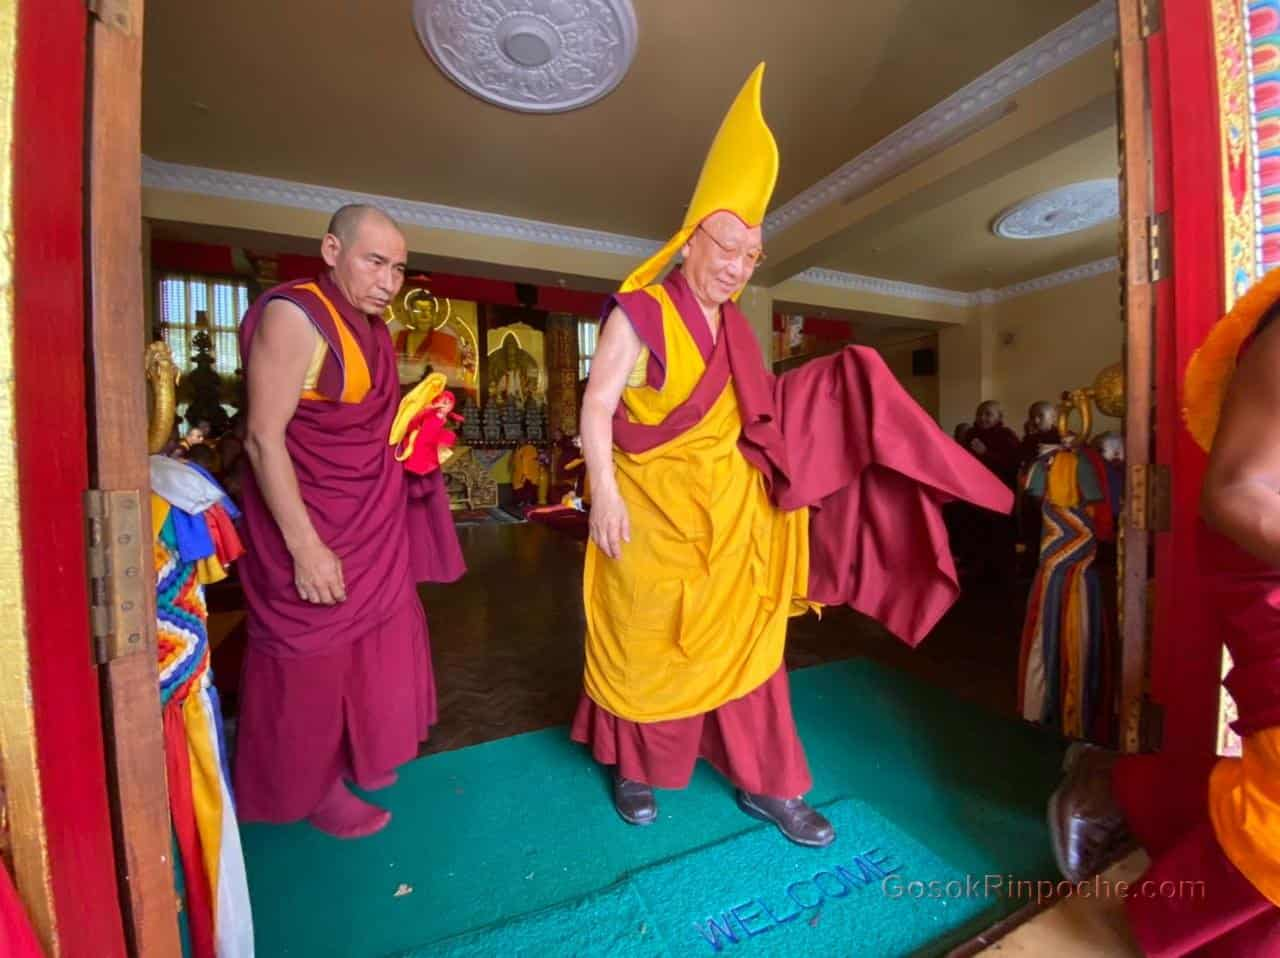 Monlam Chenmo d3 2021-02-26 at 4.31.15 AM